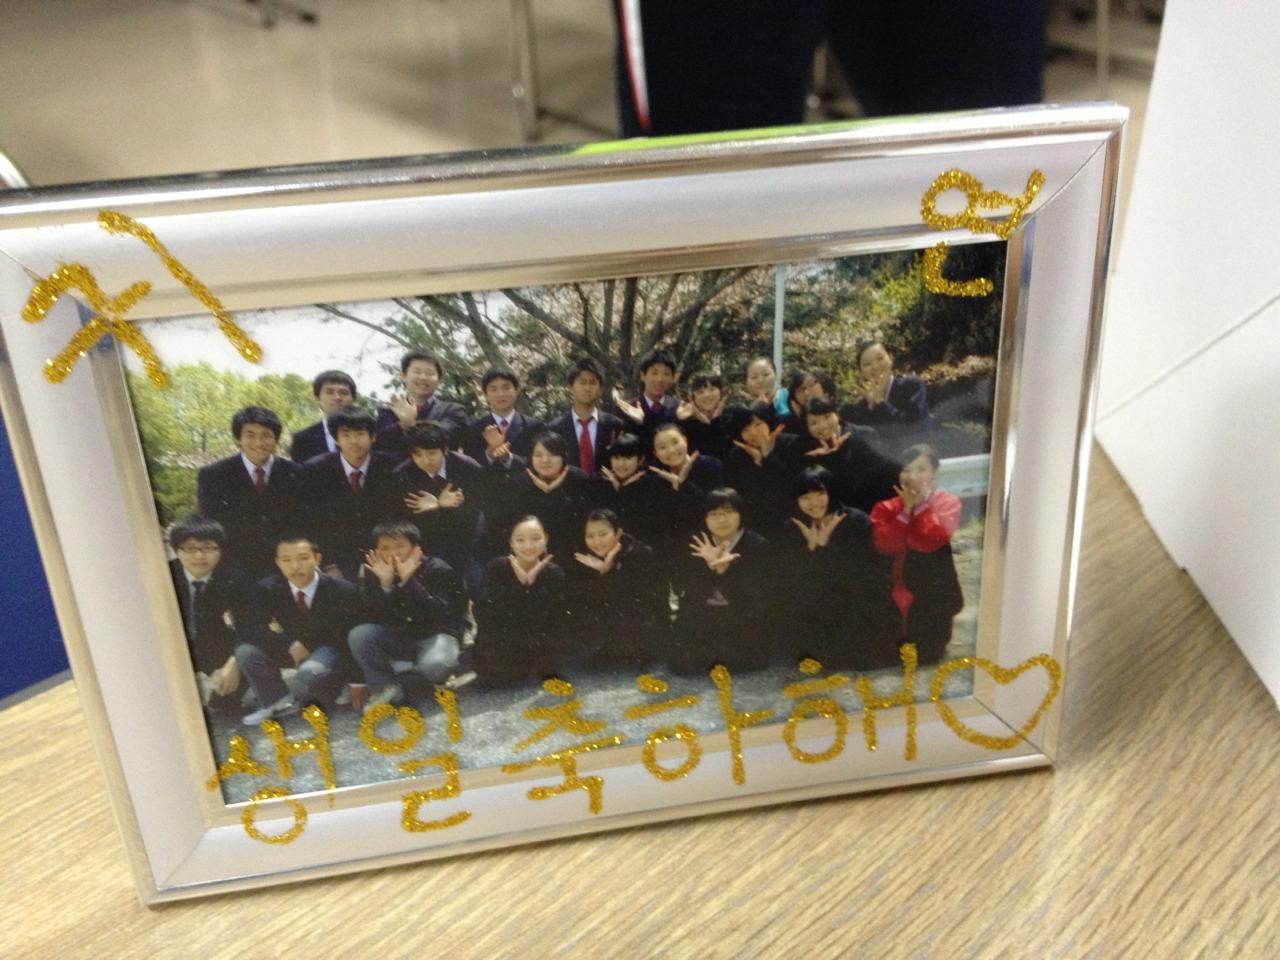 S__10944521.jpg